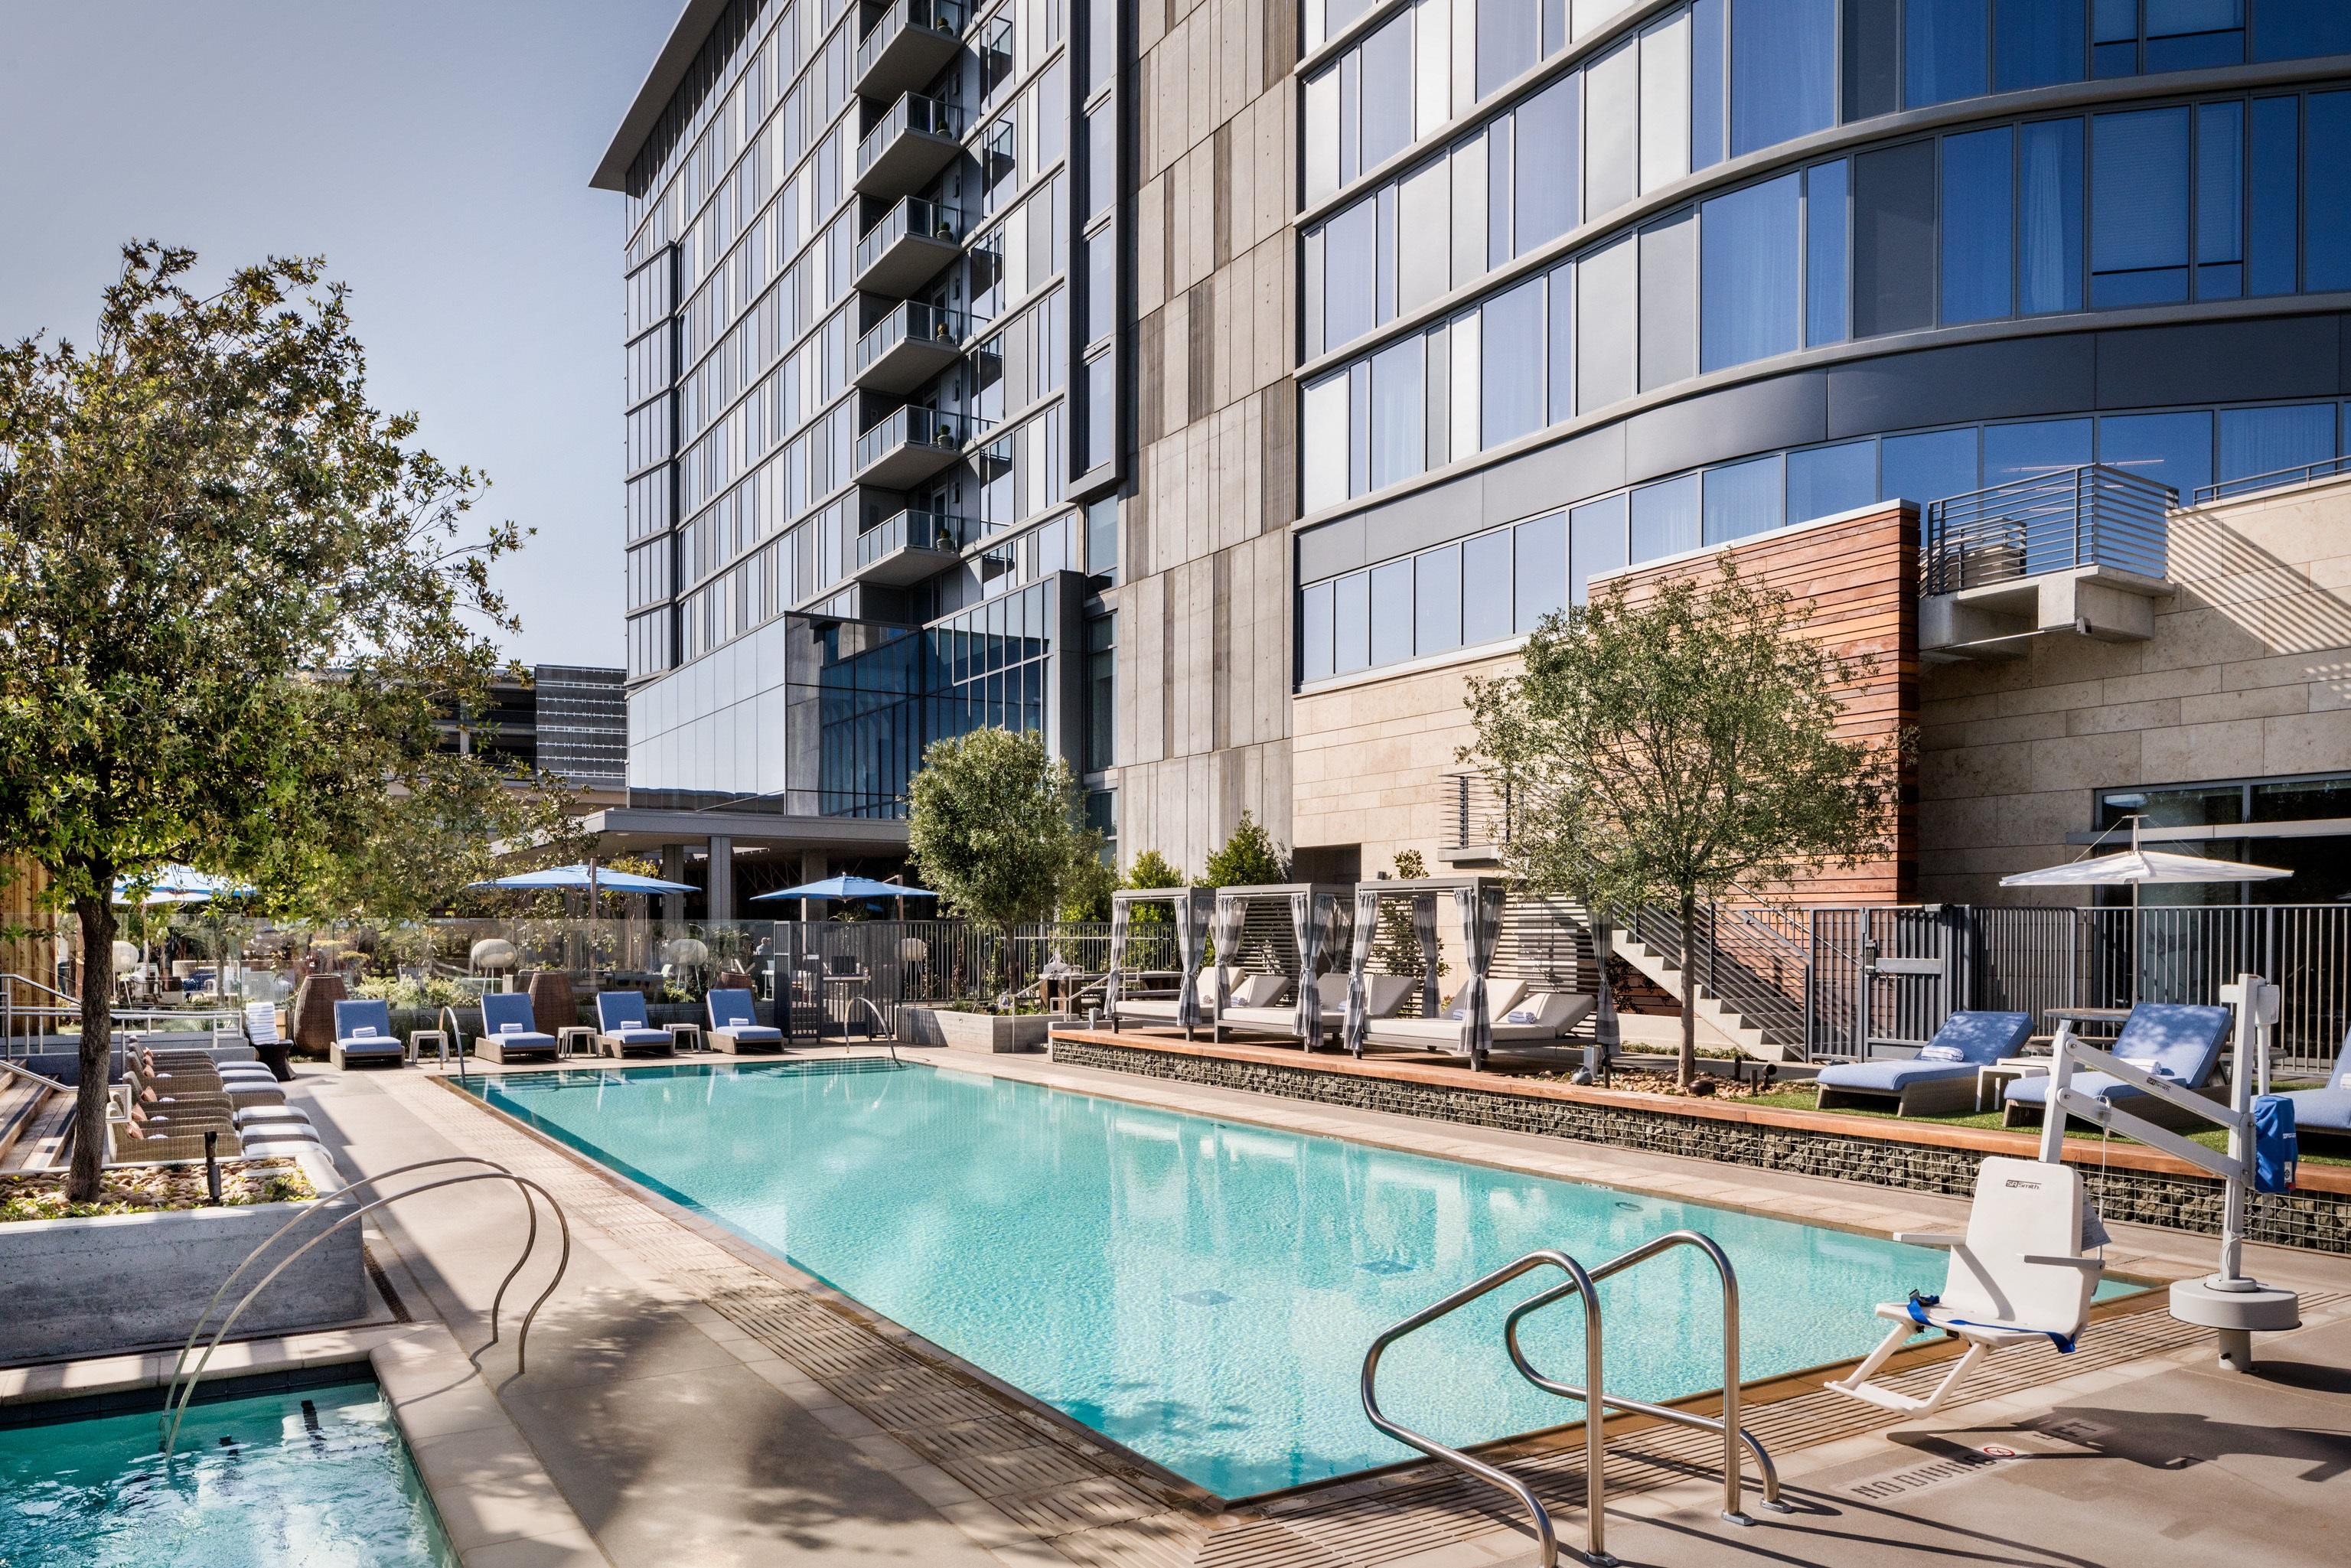 Hotel Nia Pool Exterior